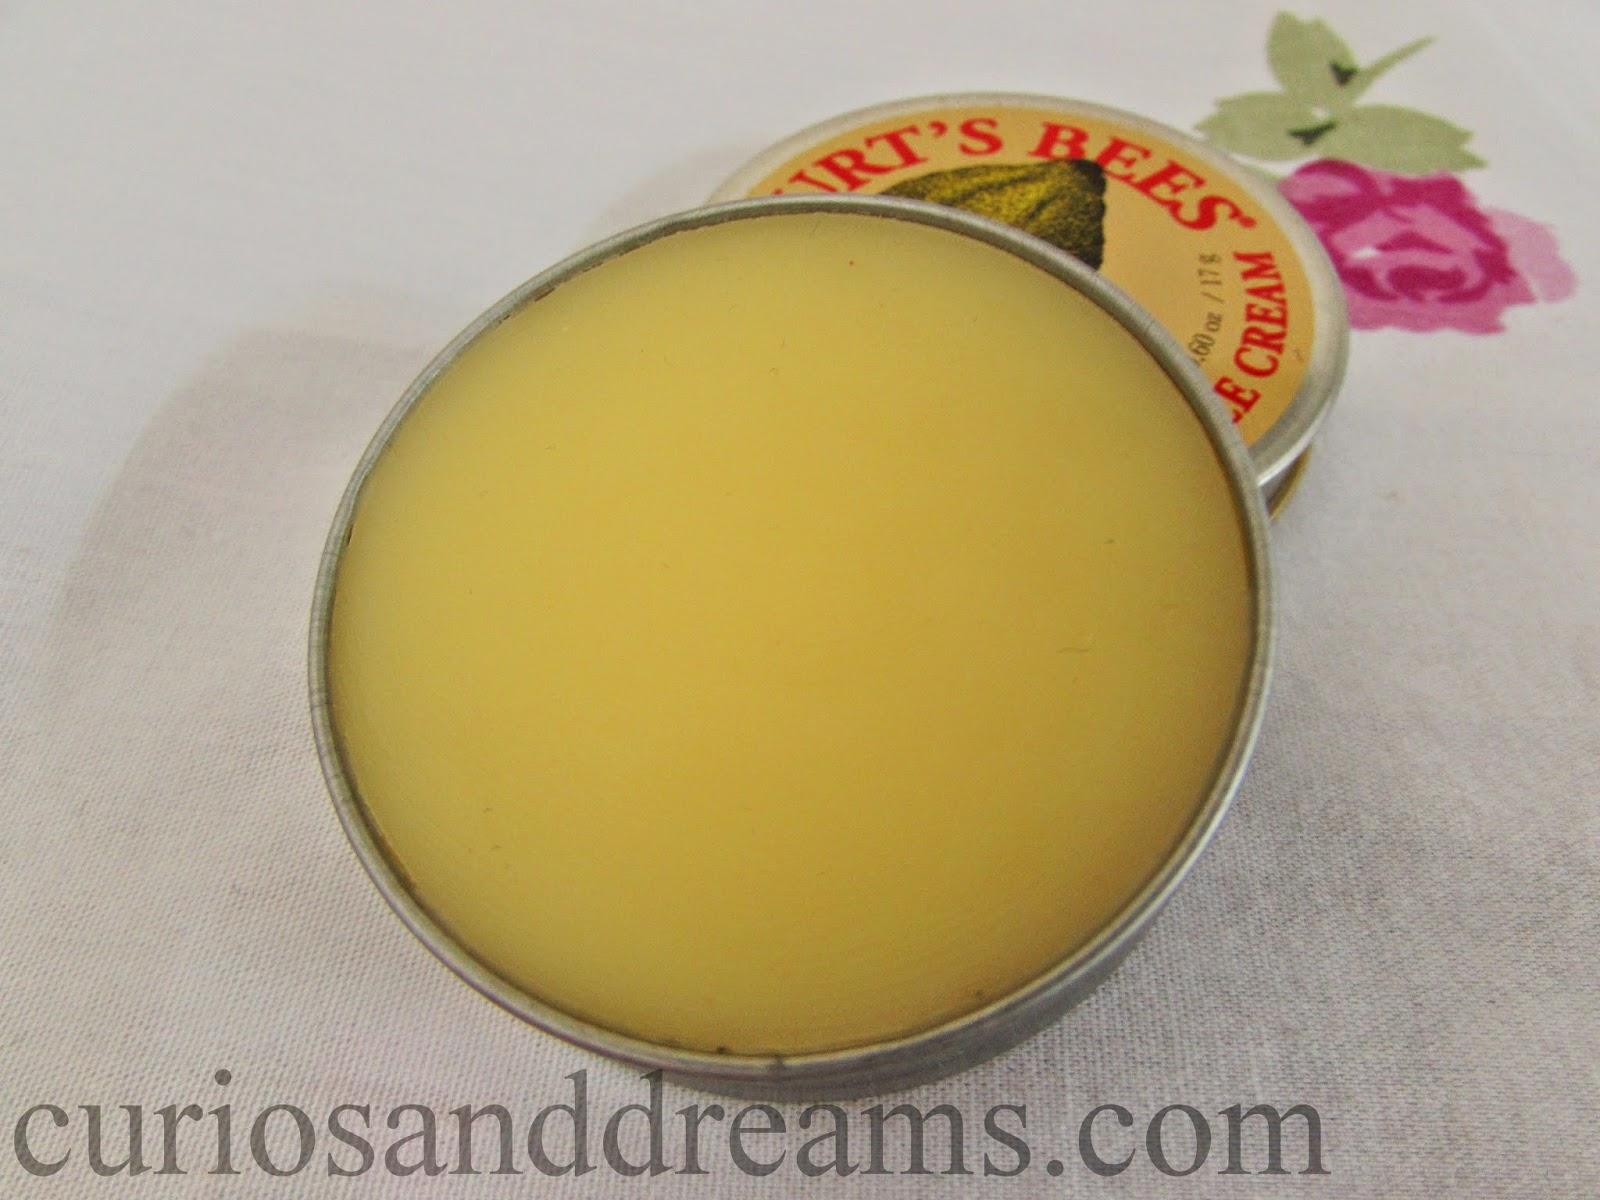 Burt's Bees Lemon Butter Cuticle Cream, Burt's Bees Lemon Butter Cuticle Cream review, Burt's Bees Cuticle Cream